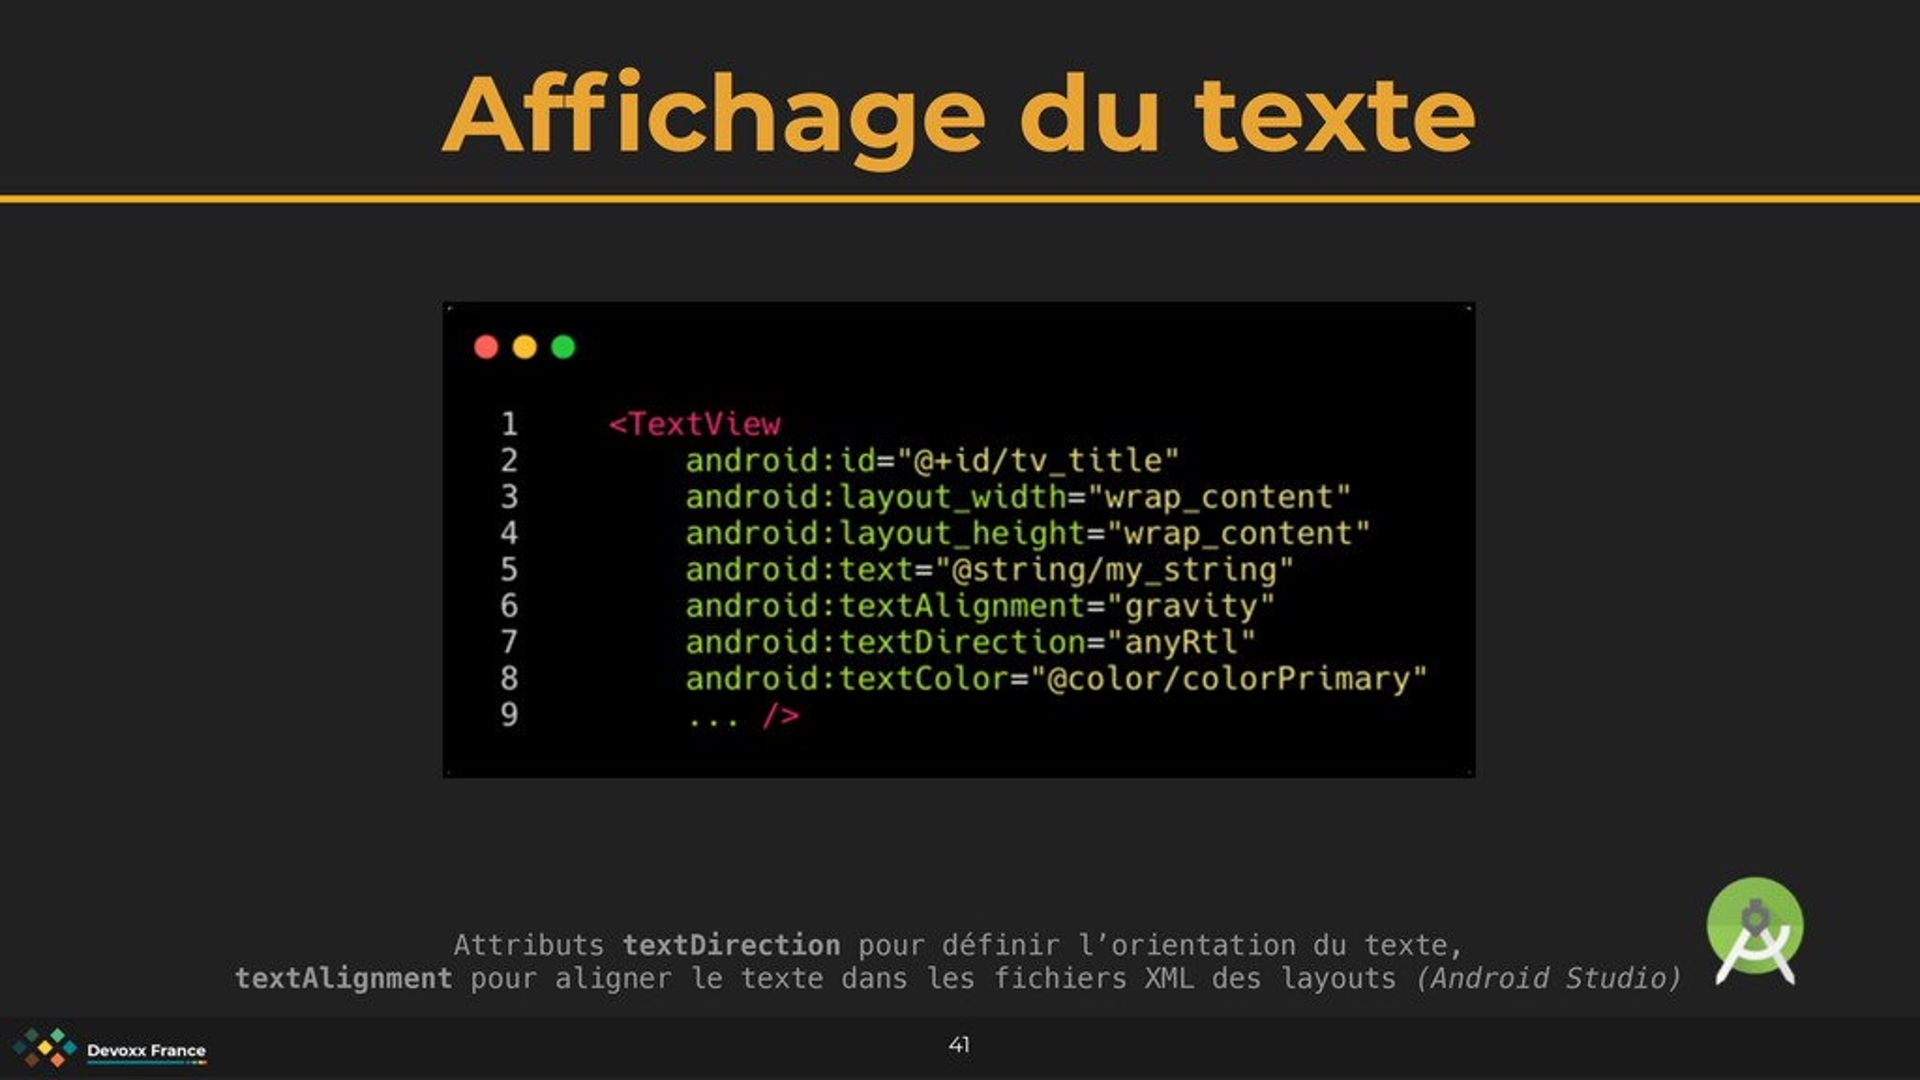 Af fi chage du texte 41 Attributs textDirection...